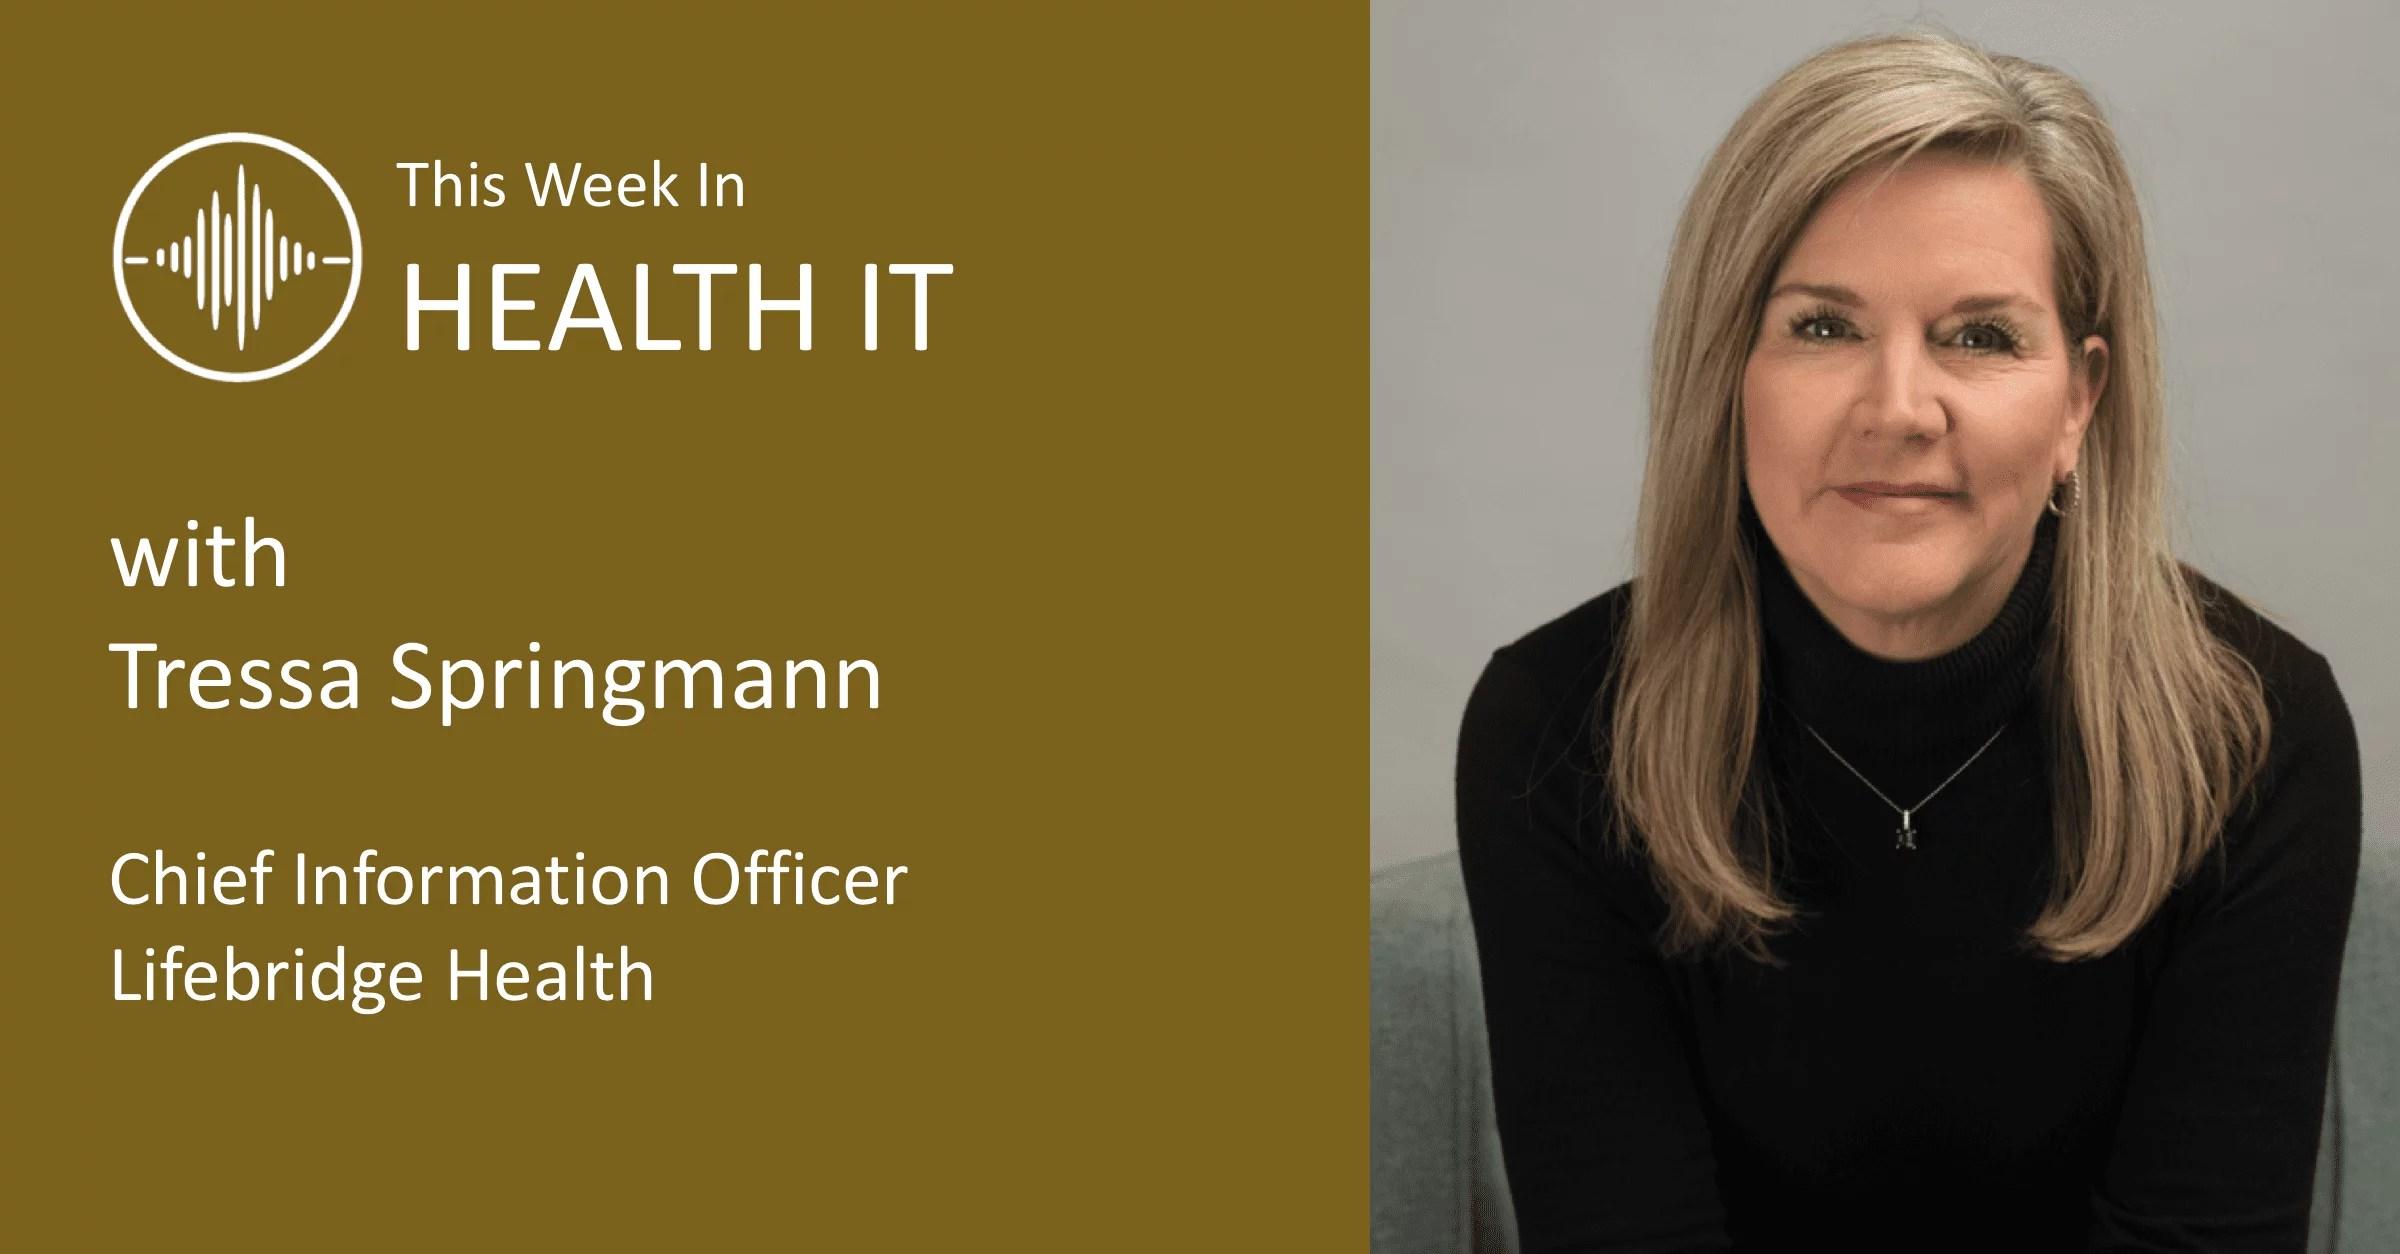 This Week in Health IT - LifeBridge Tressa Springmann